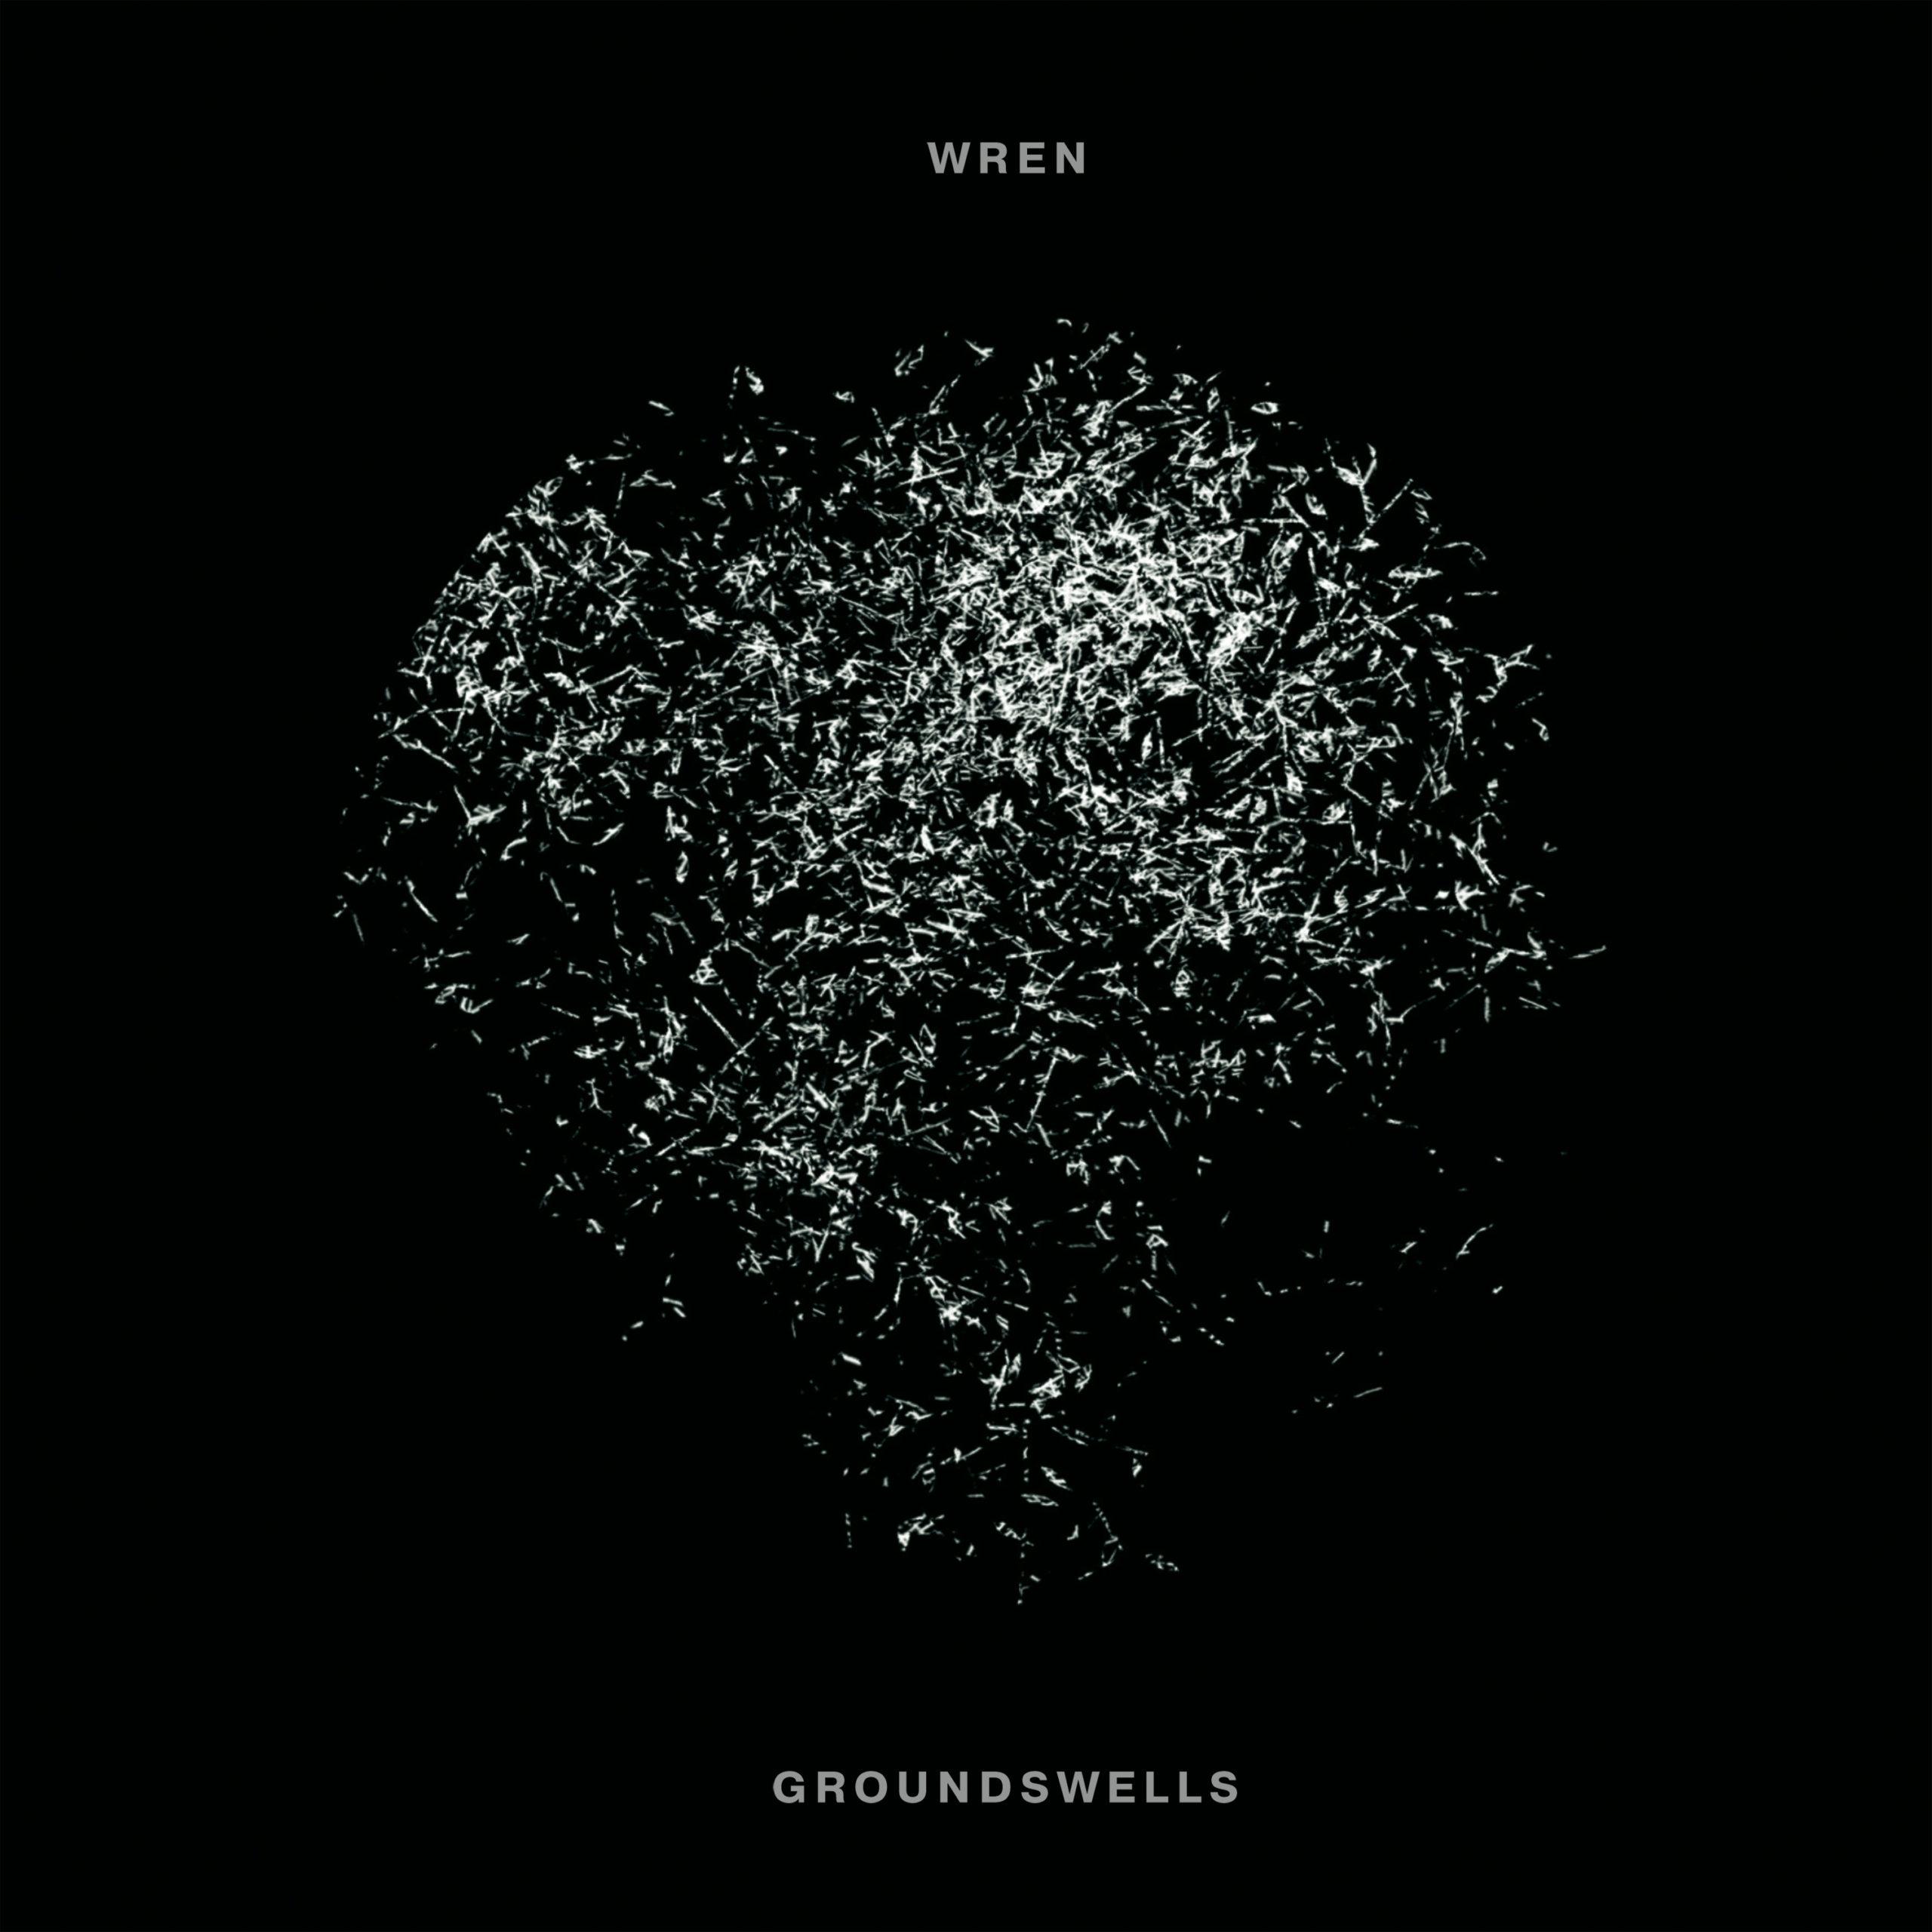 wren groundswells